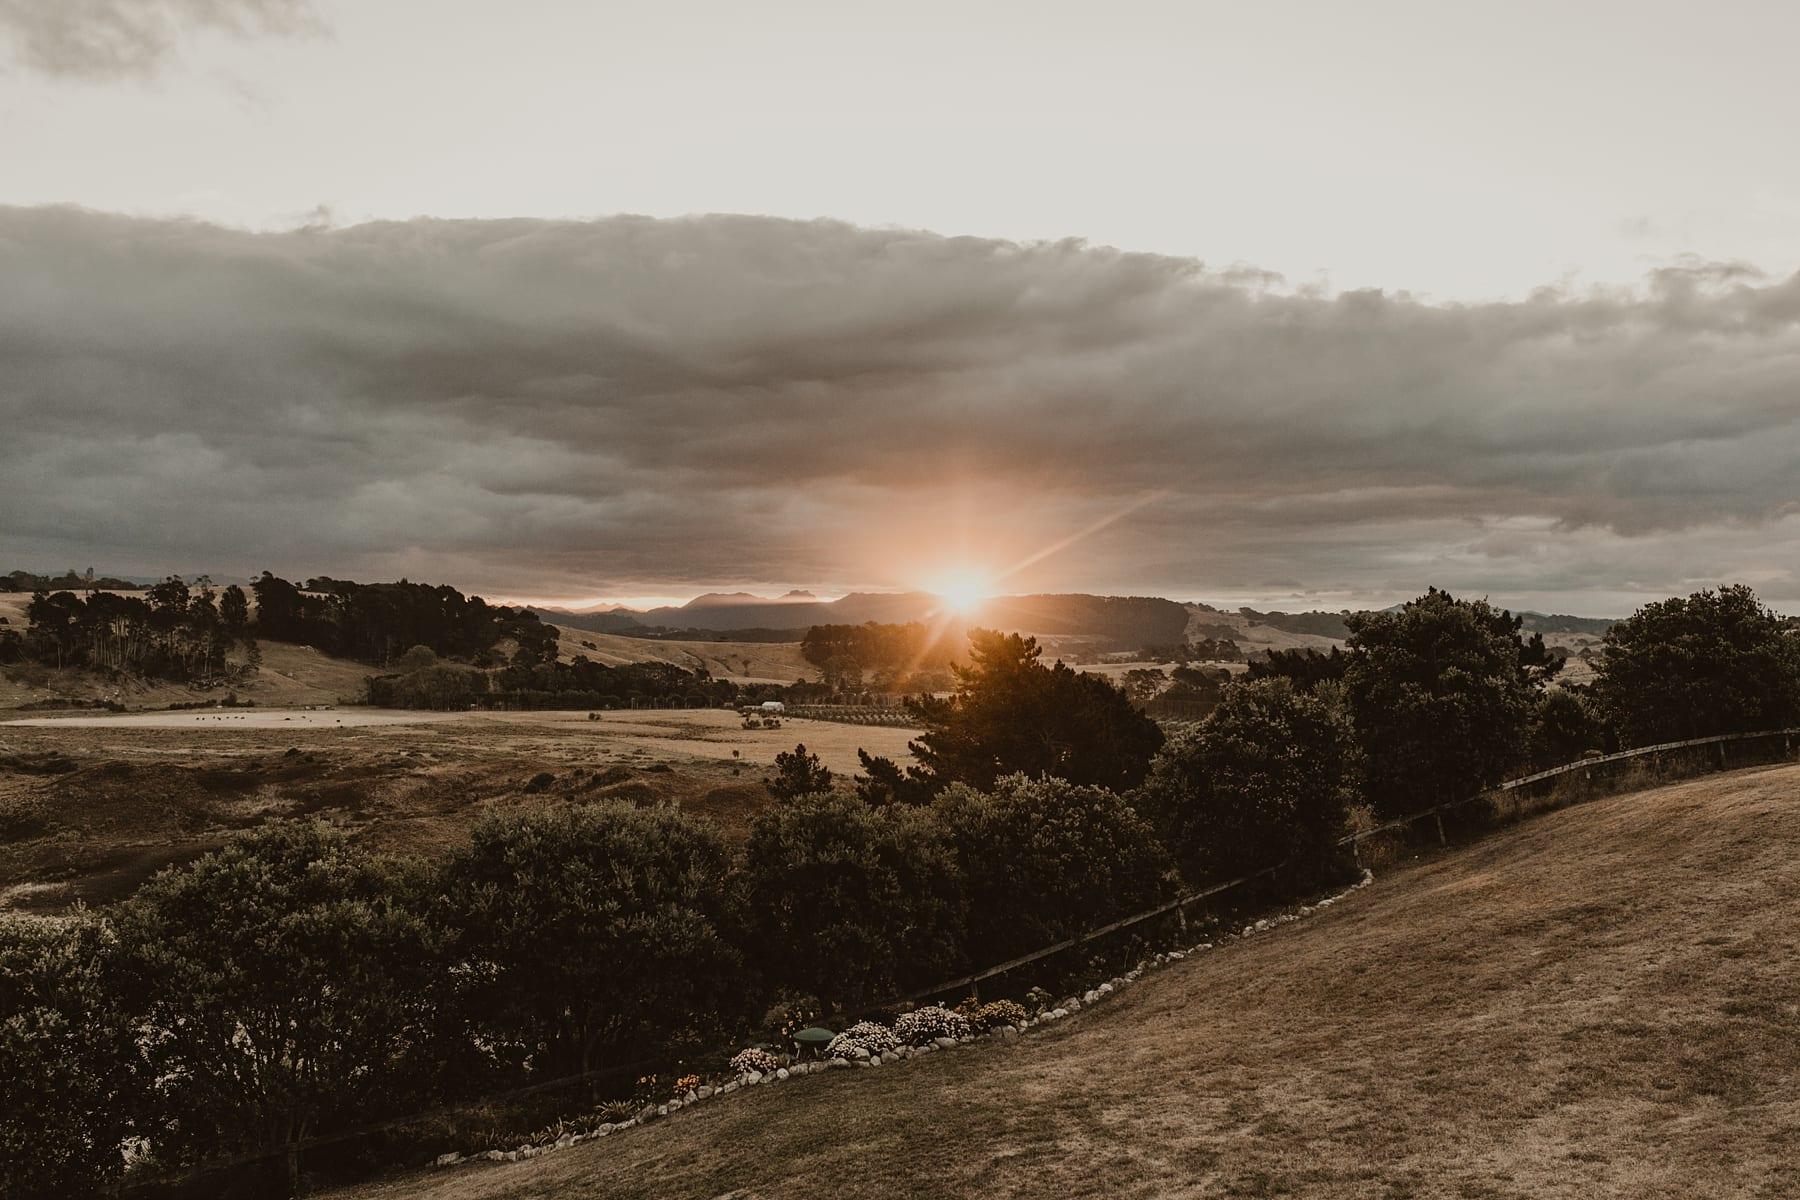 sun setting over landscape